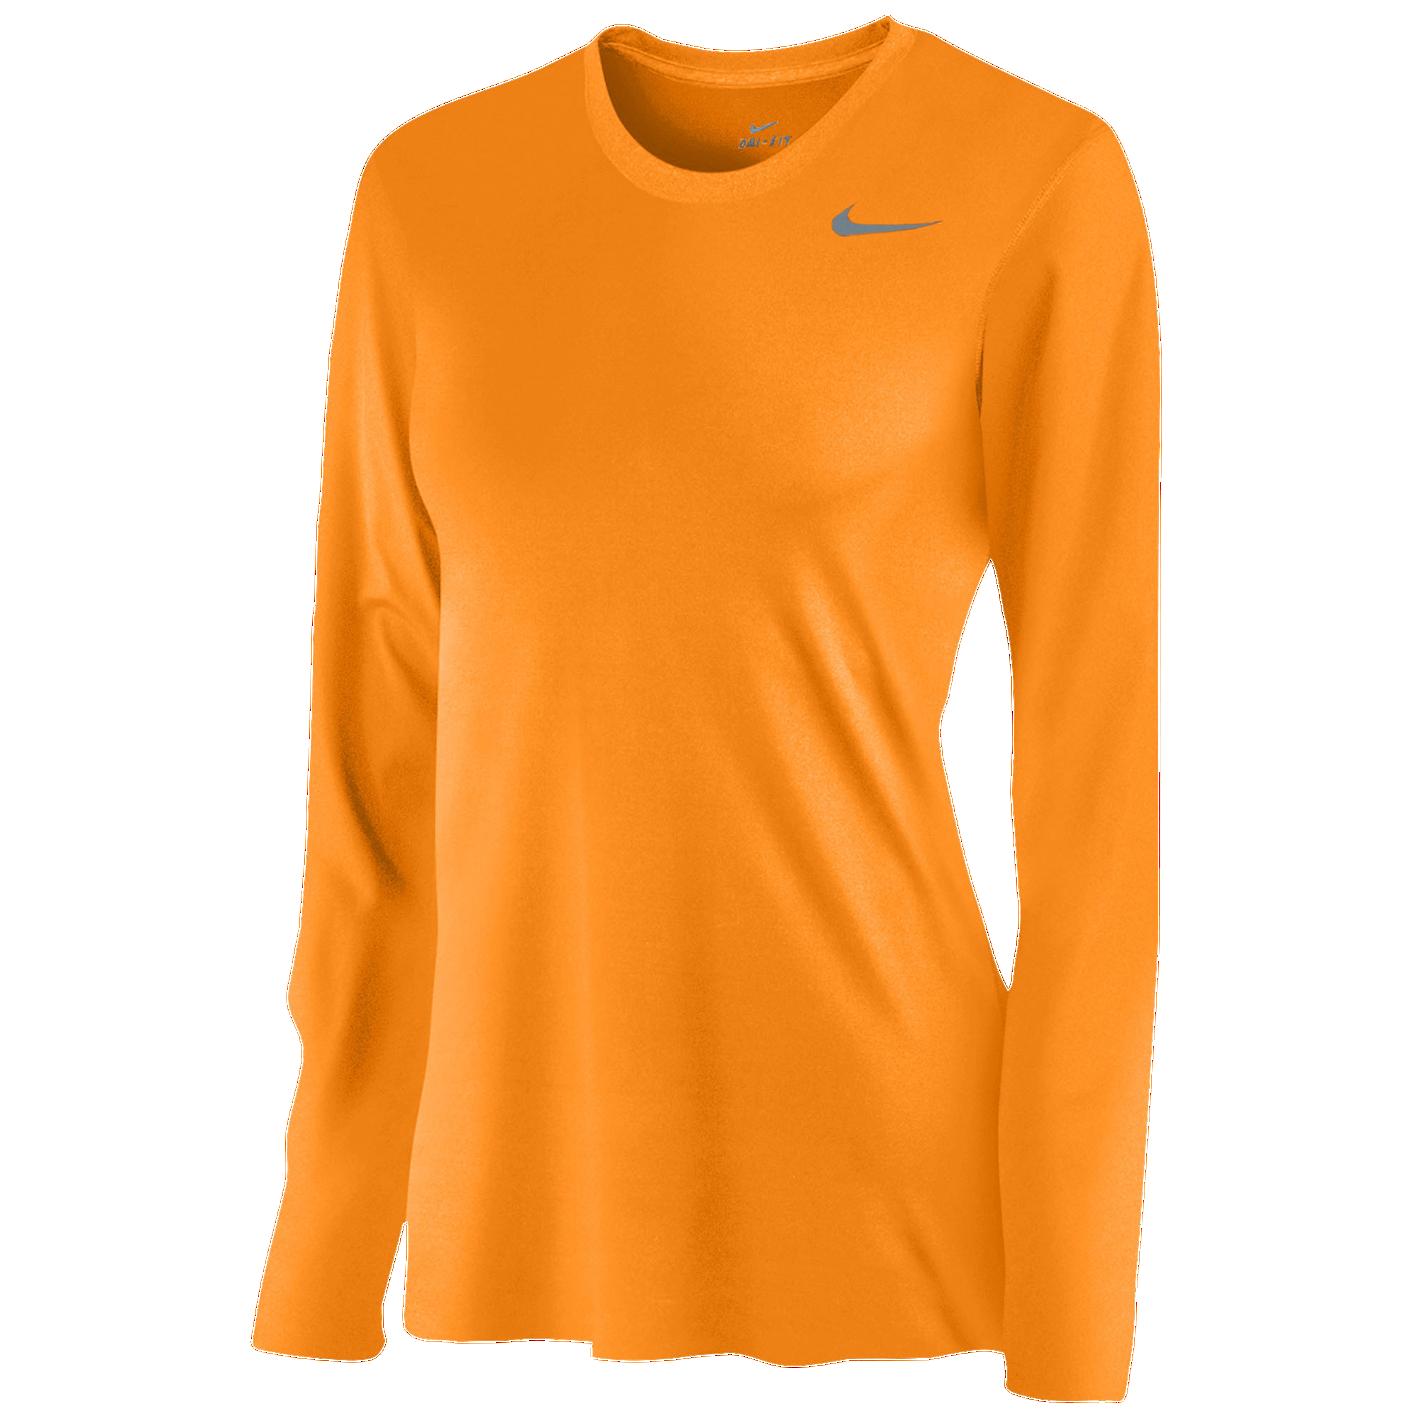 324c6a7310b1 Nike Team Legend Long Sleeve T-Shirt - Women s - Training - Clothing ...